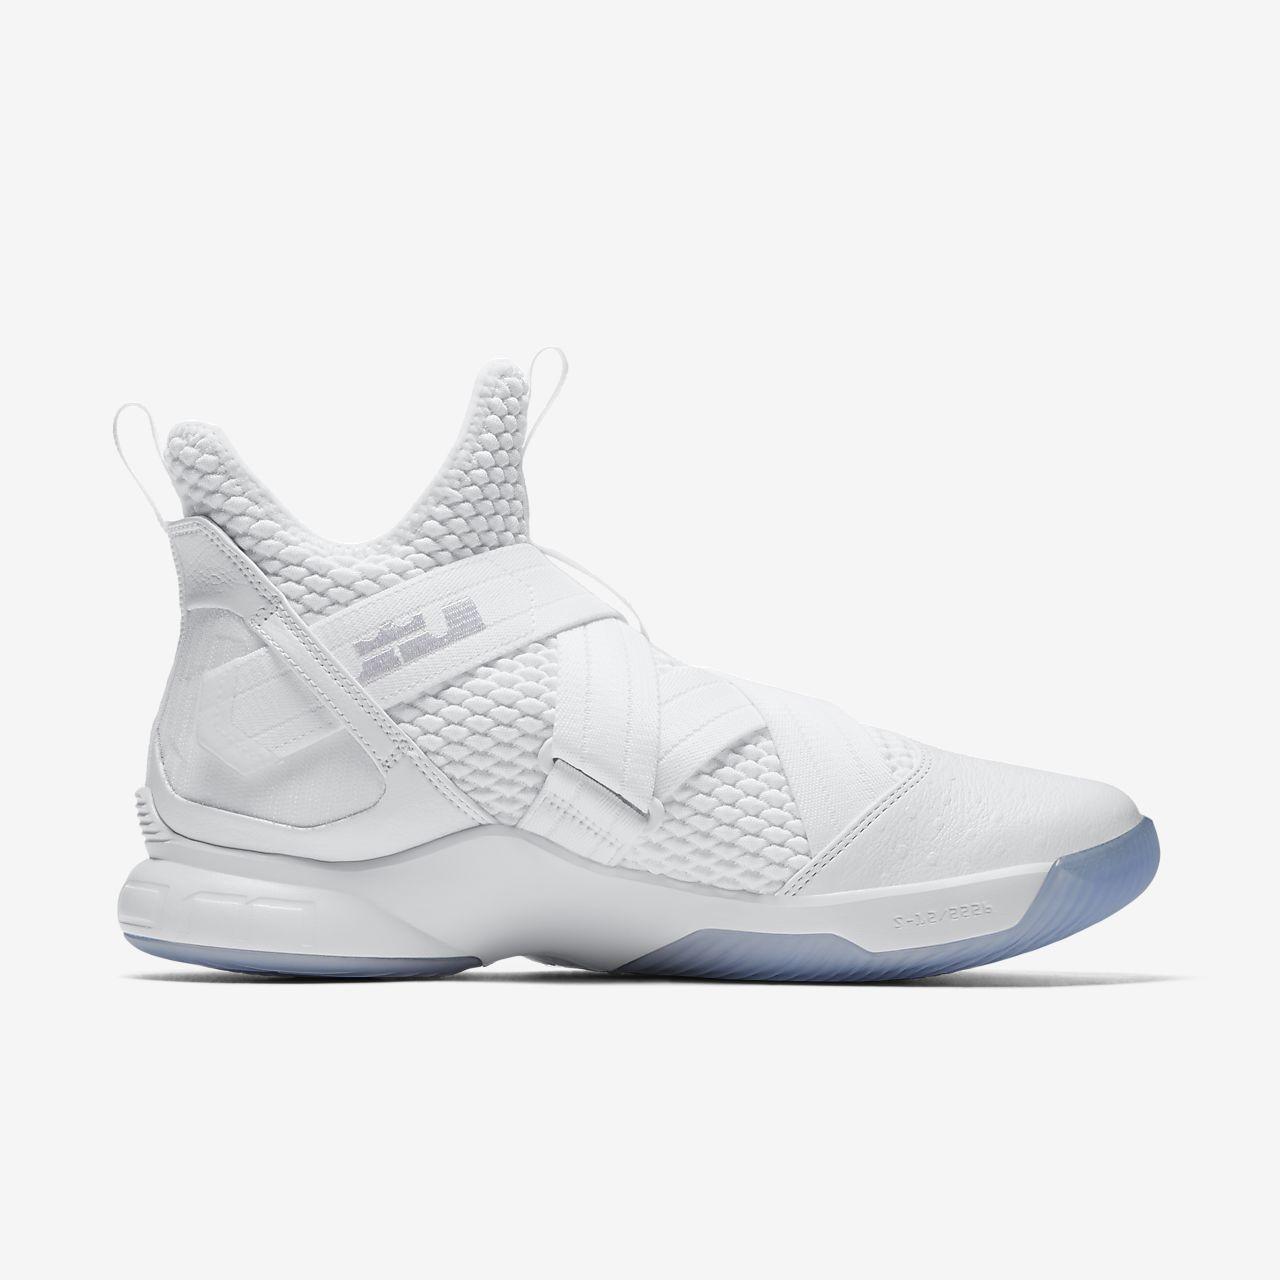 1befb31421169 LeBron Soldier 12 SFG Basketball Shoe. Nike.com CA